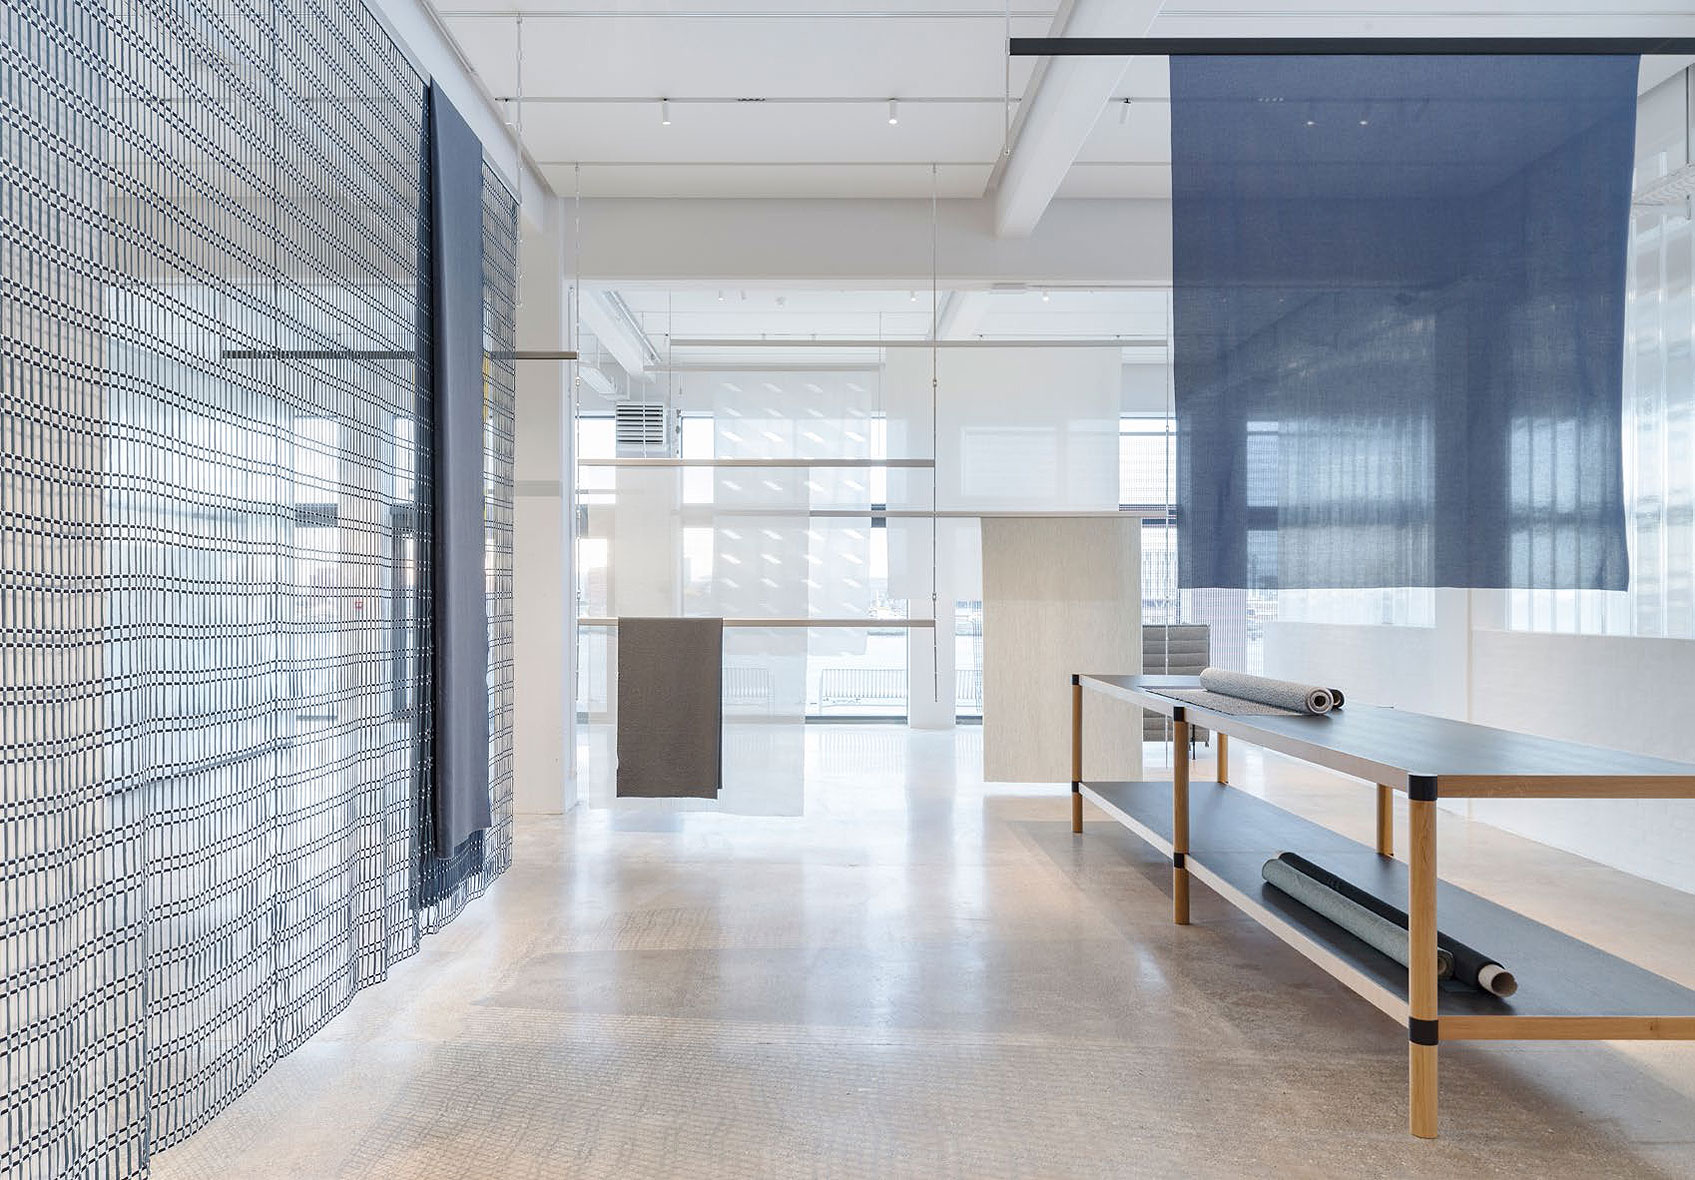 Studio bouroullec dise a el nuevo showroom de kvadrat - Disena studio ...